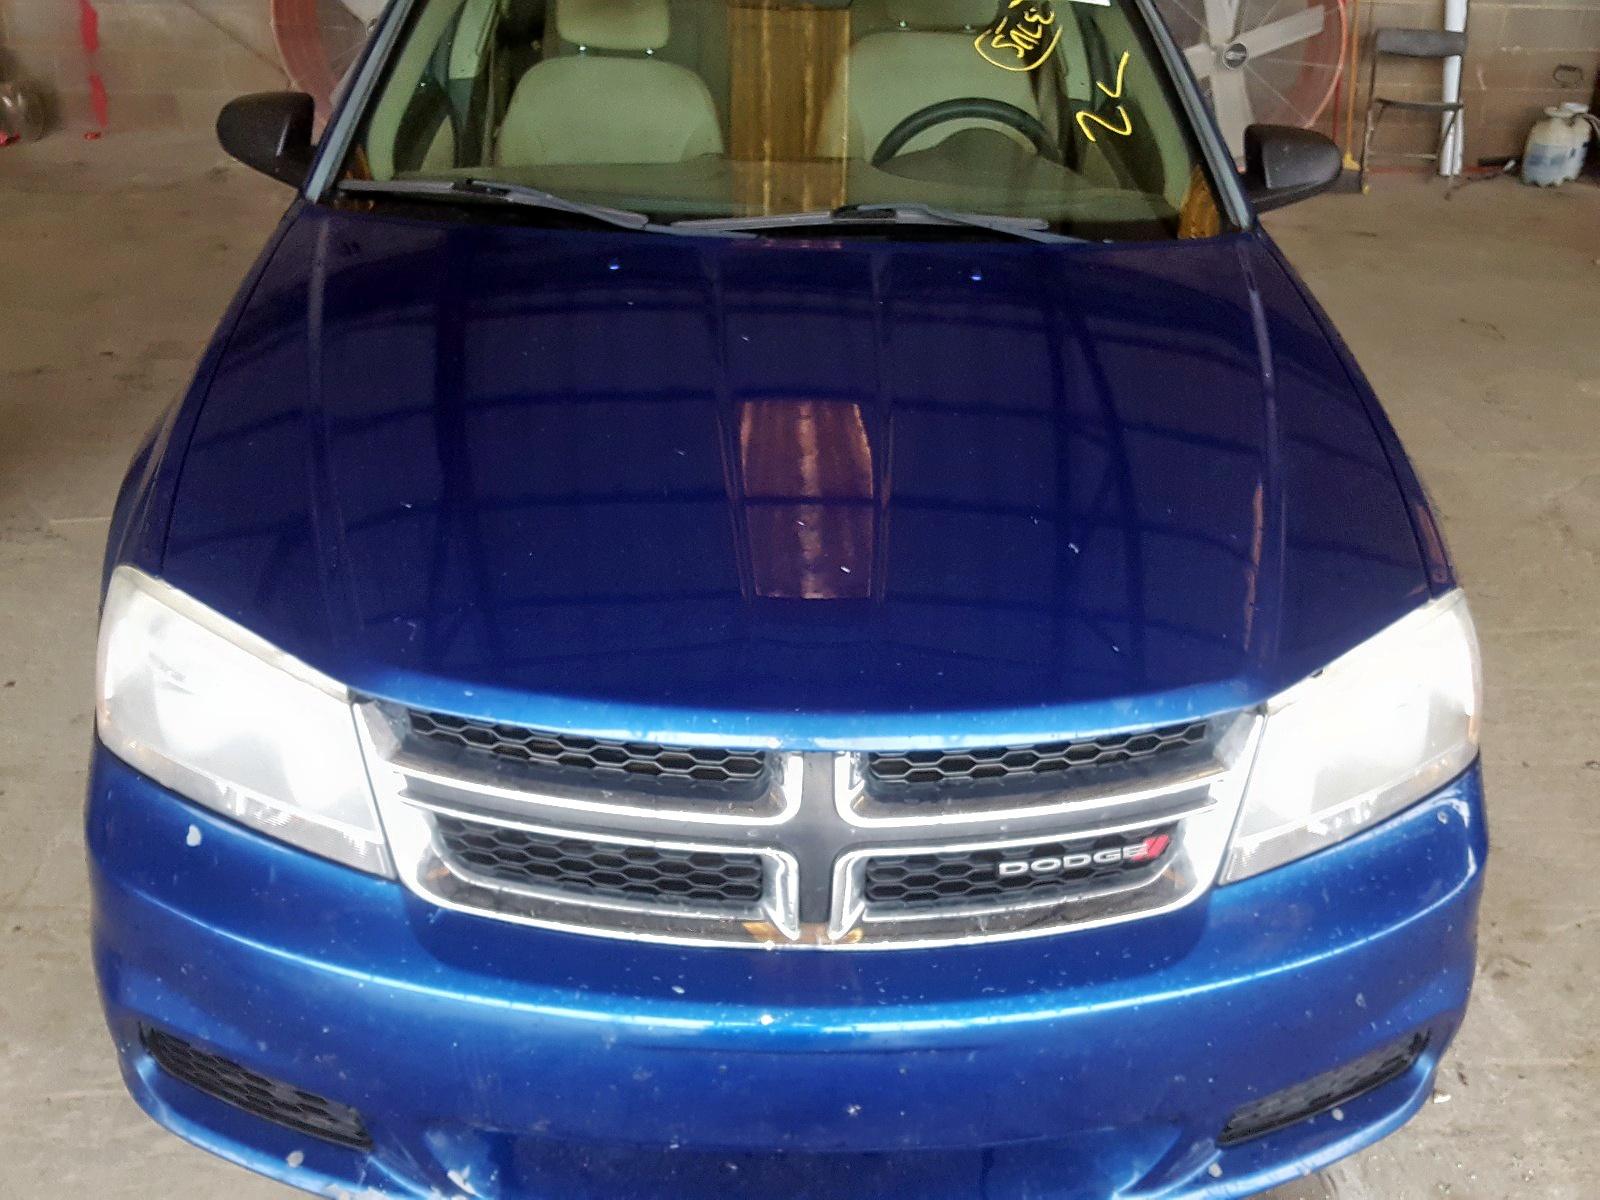 1C3CDZAGXCN322044 - 2012 Dodge Avenger Se 3.6L engine view